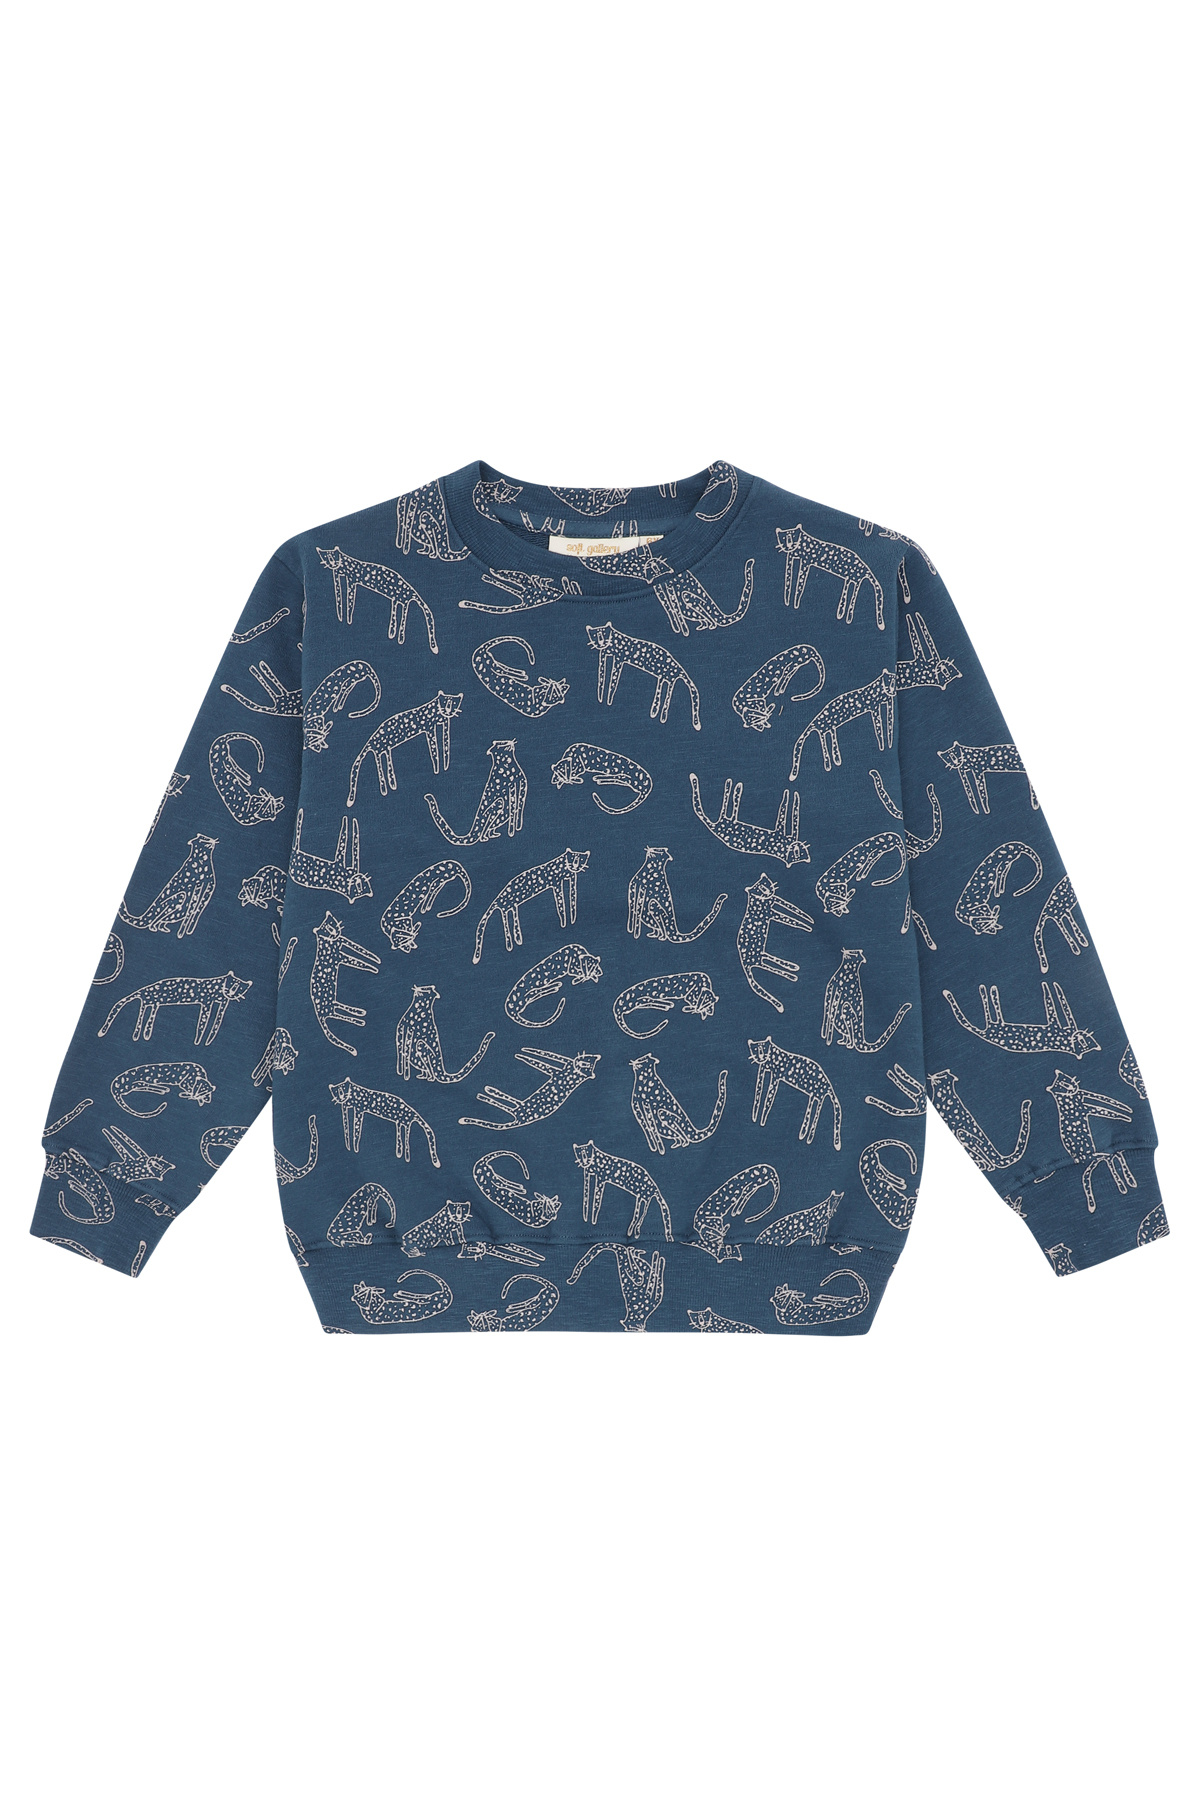 Baptiste sweatshirt - Majolica Blue-1